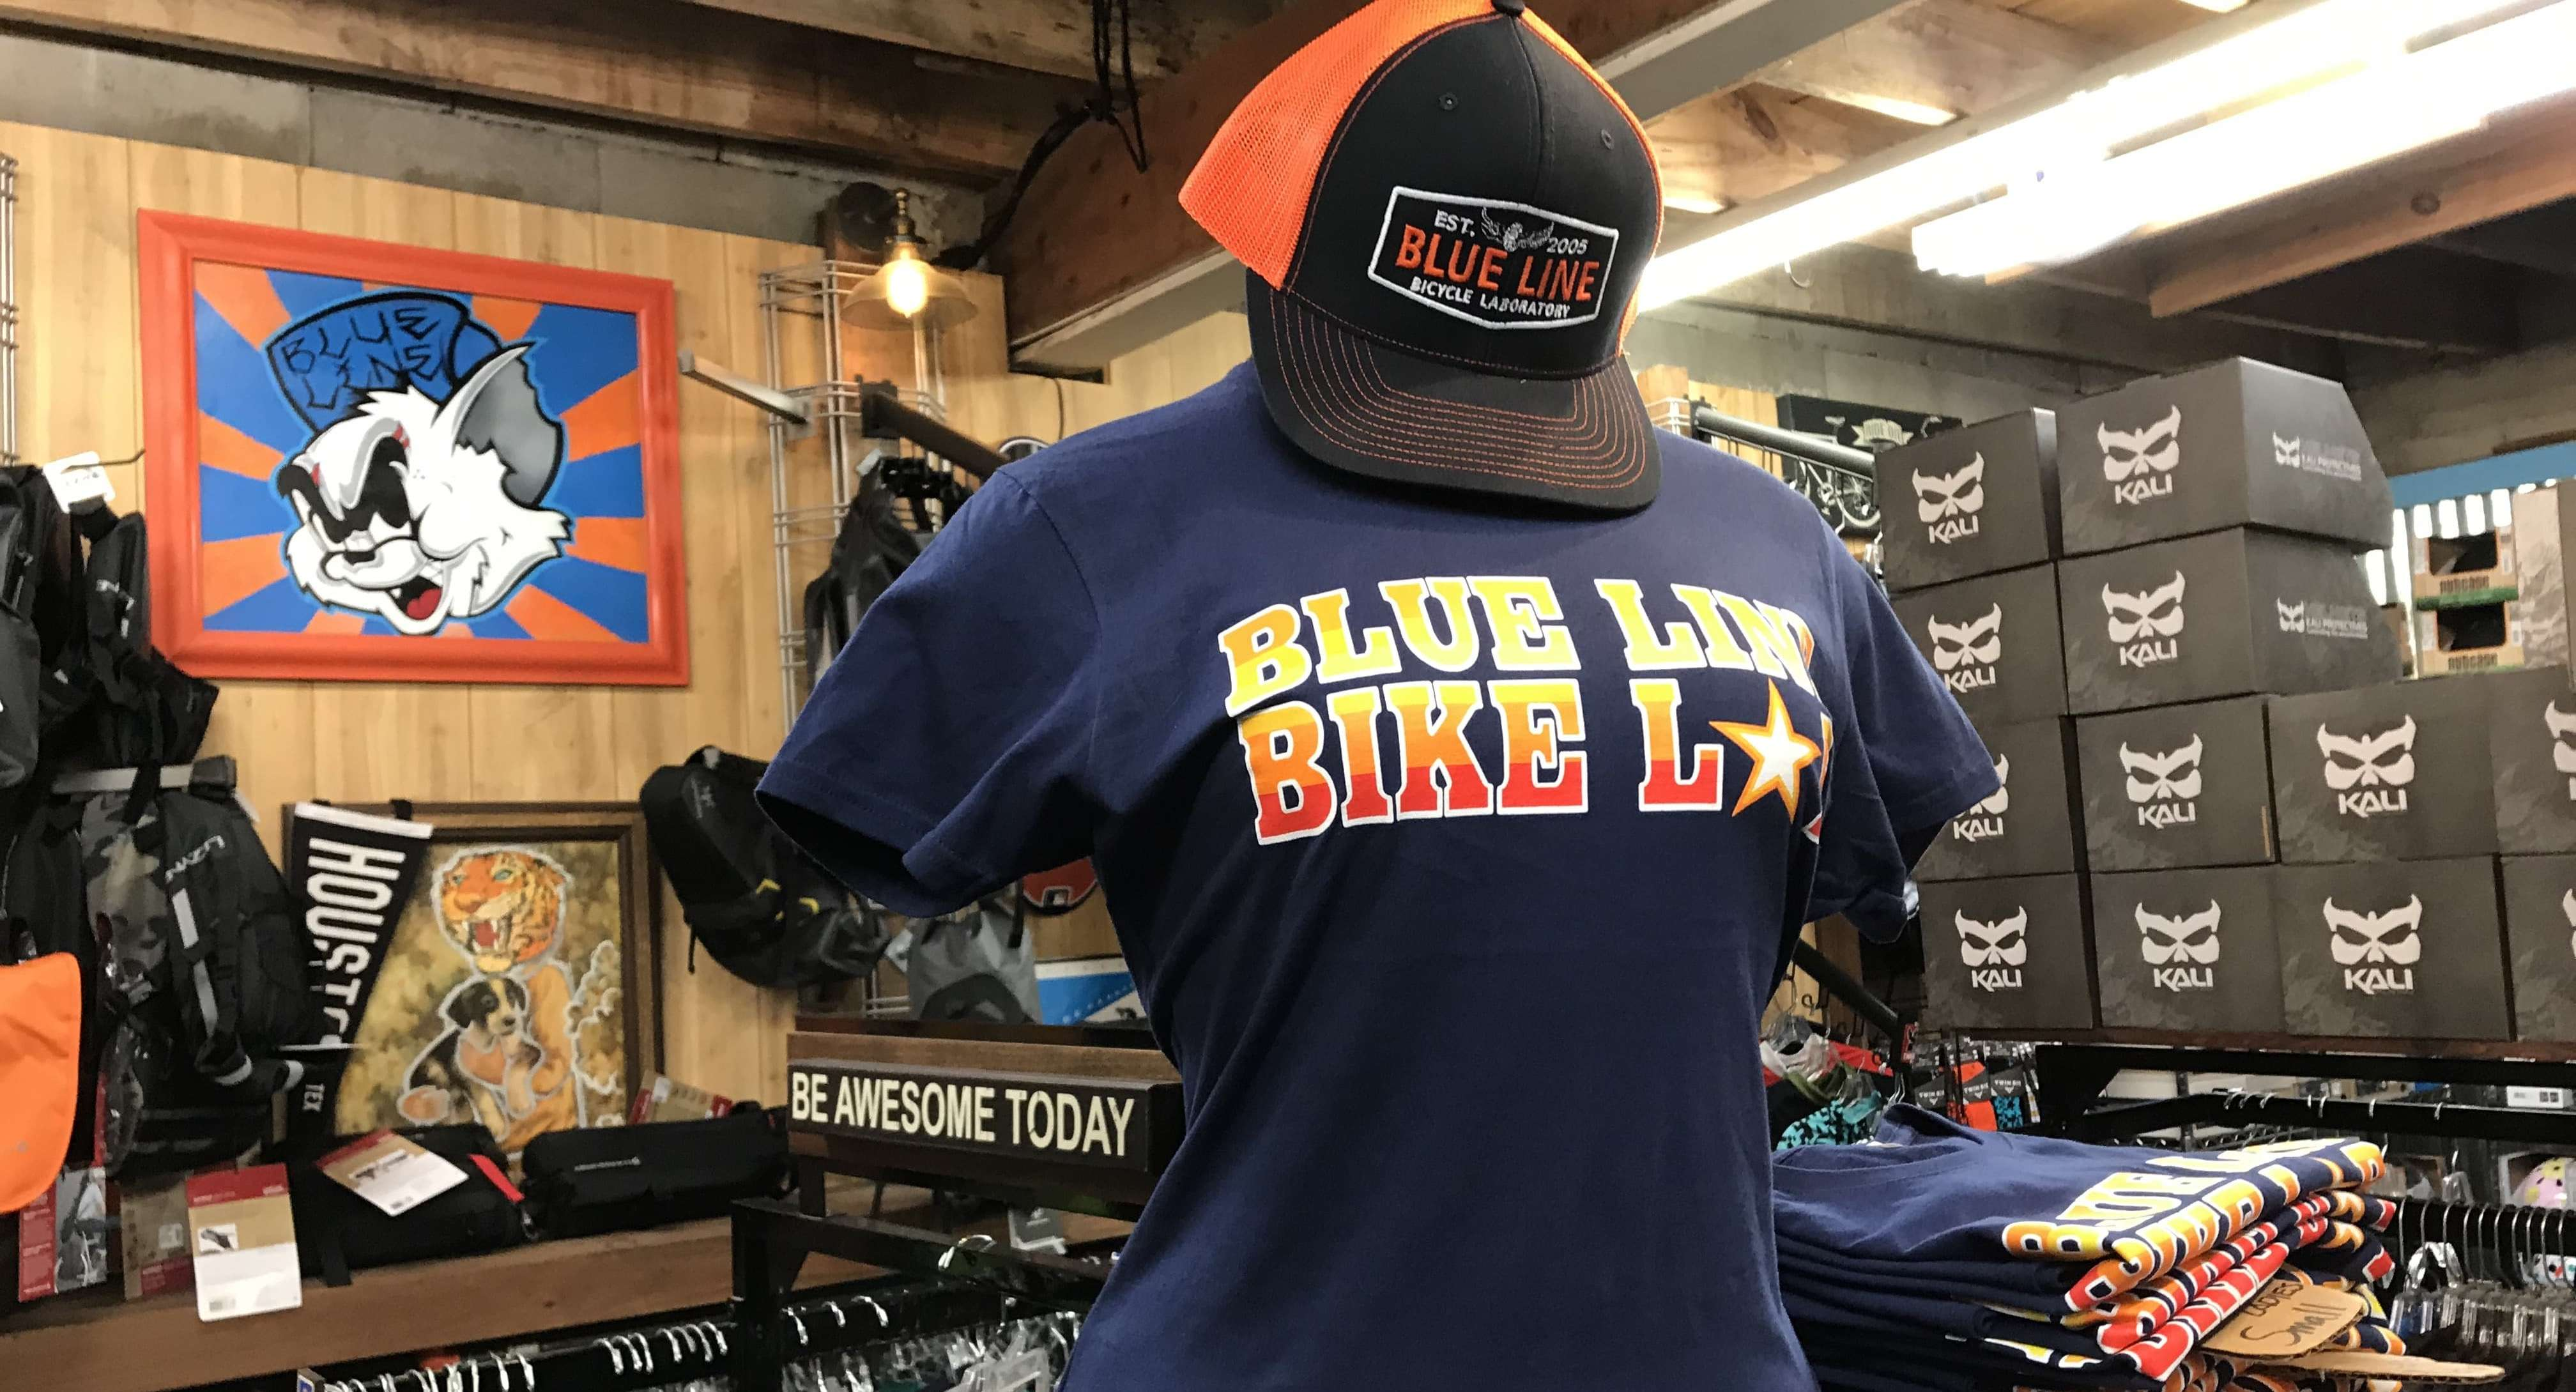 houston limited edition blue line bike lab shirts. It was a near win!